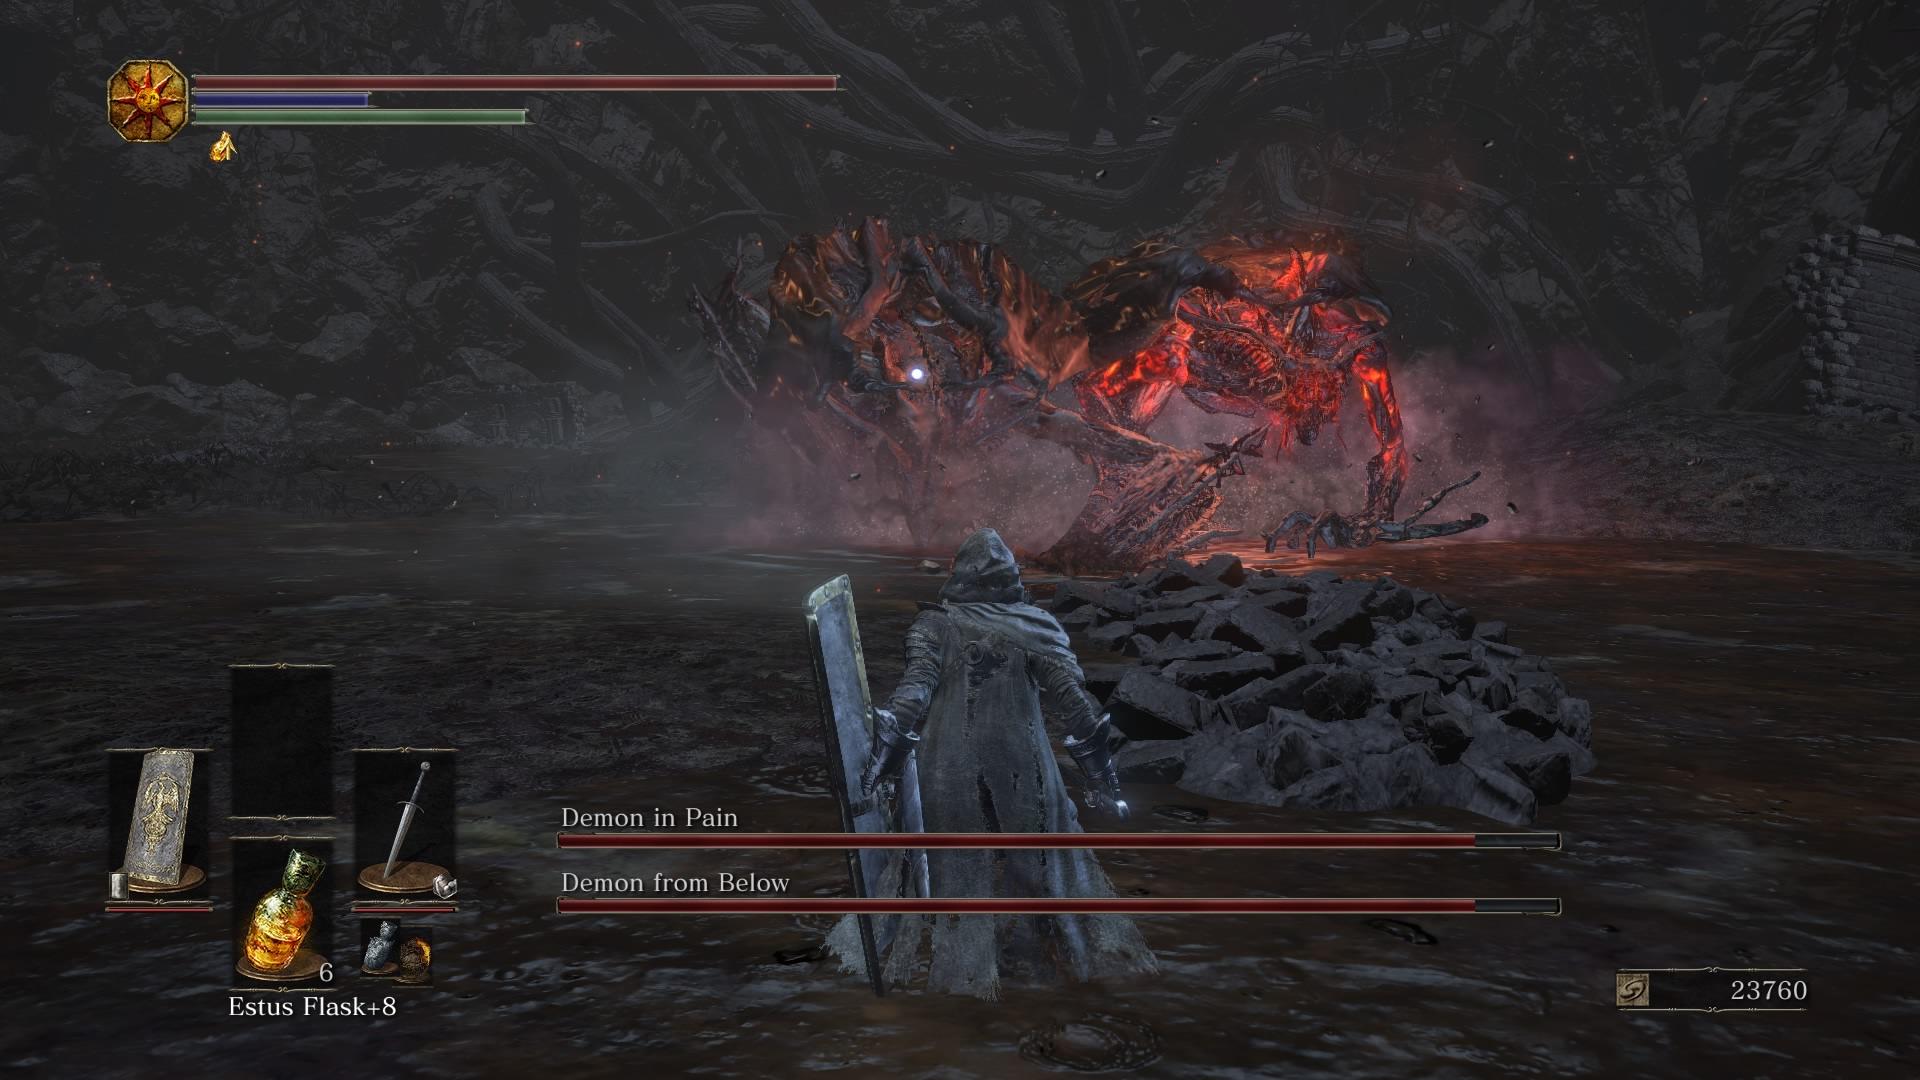 Dark Souls 3: The Ringed City - Full Walkthrough | Dreg Heap